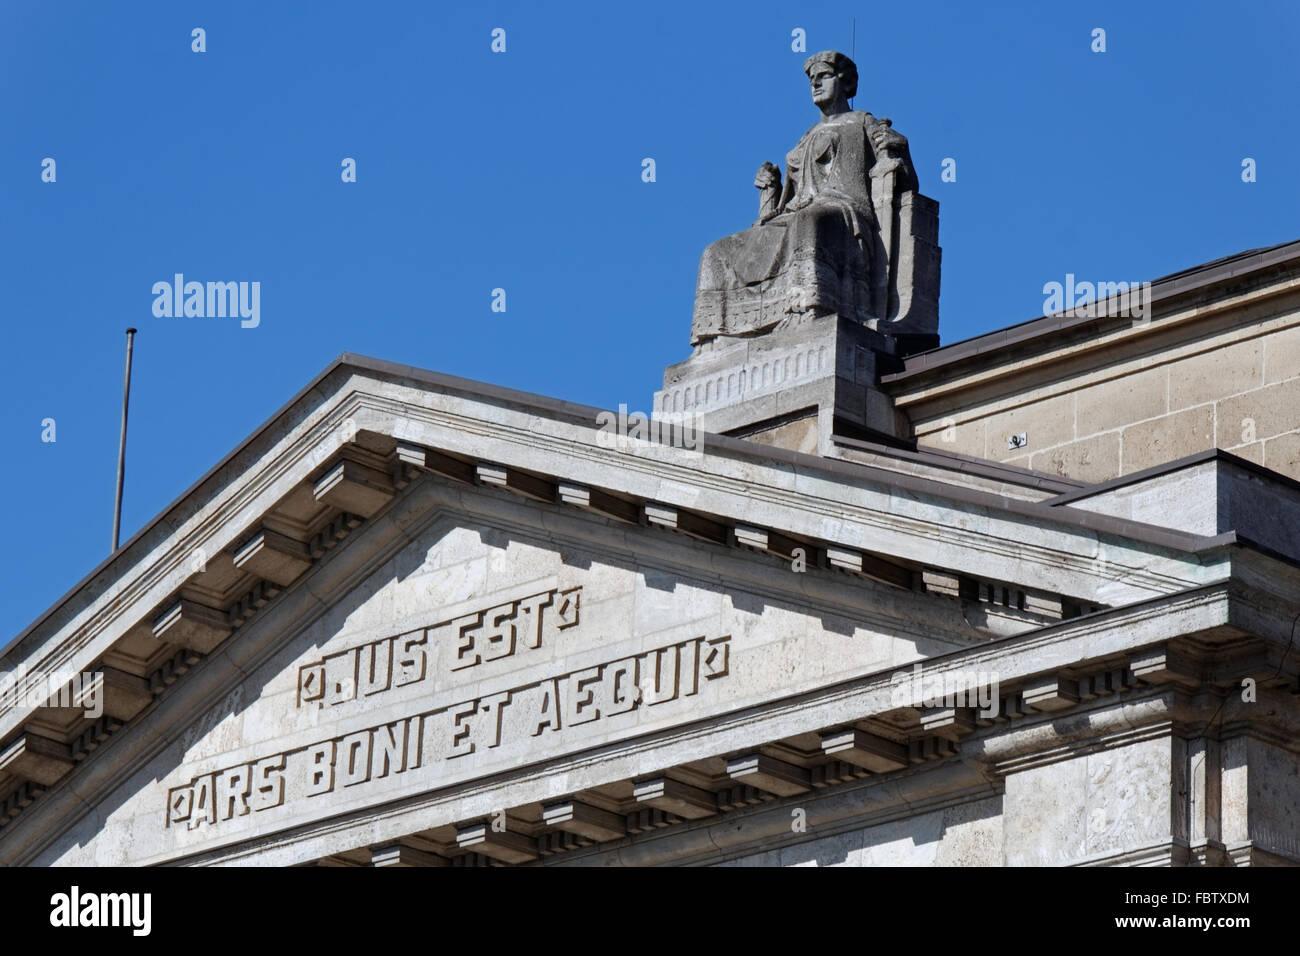 Hanseatic higher regional court in Hamburg Stock Photo